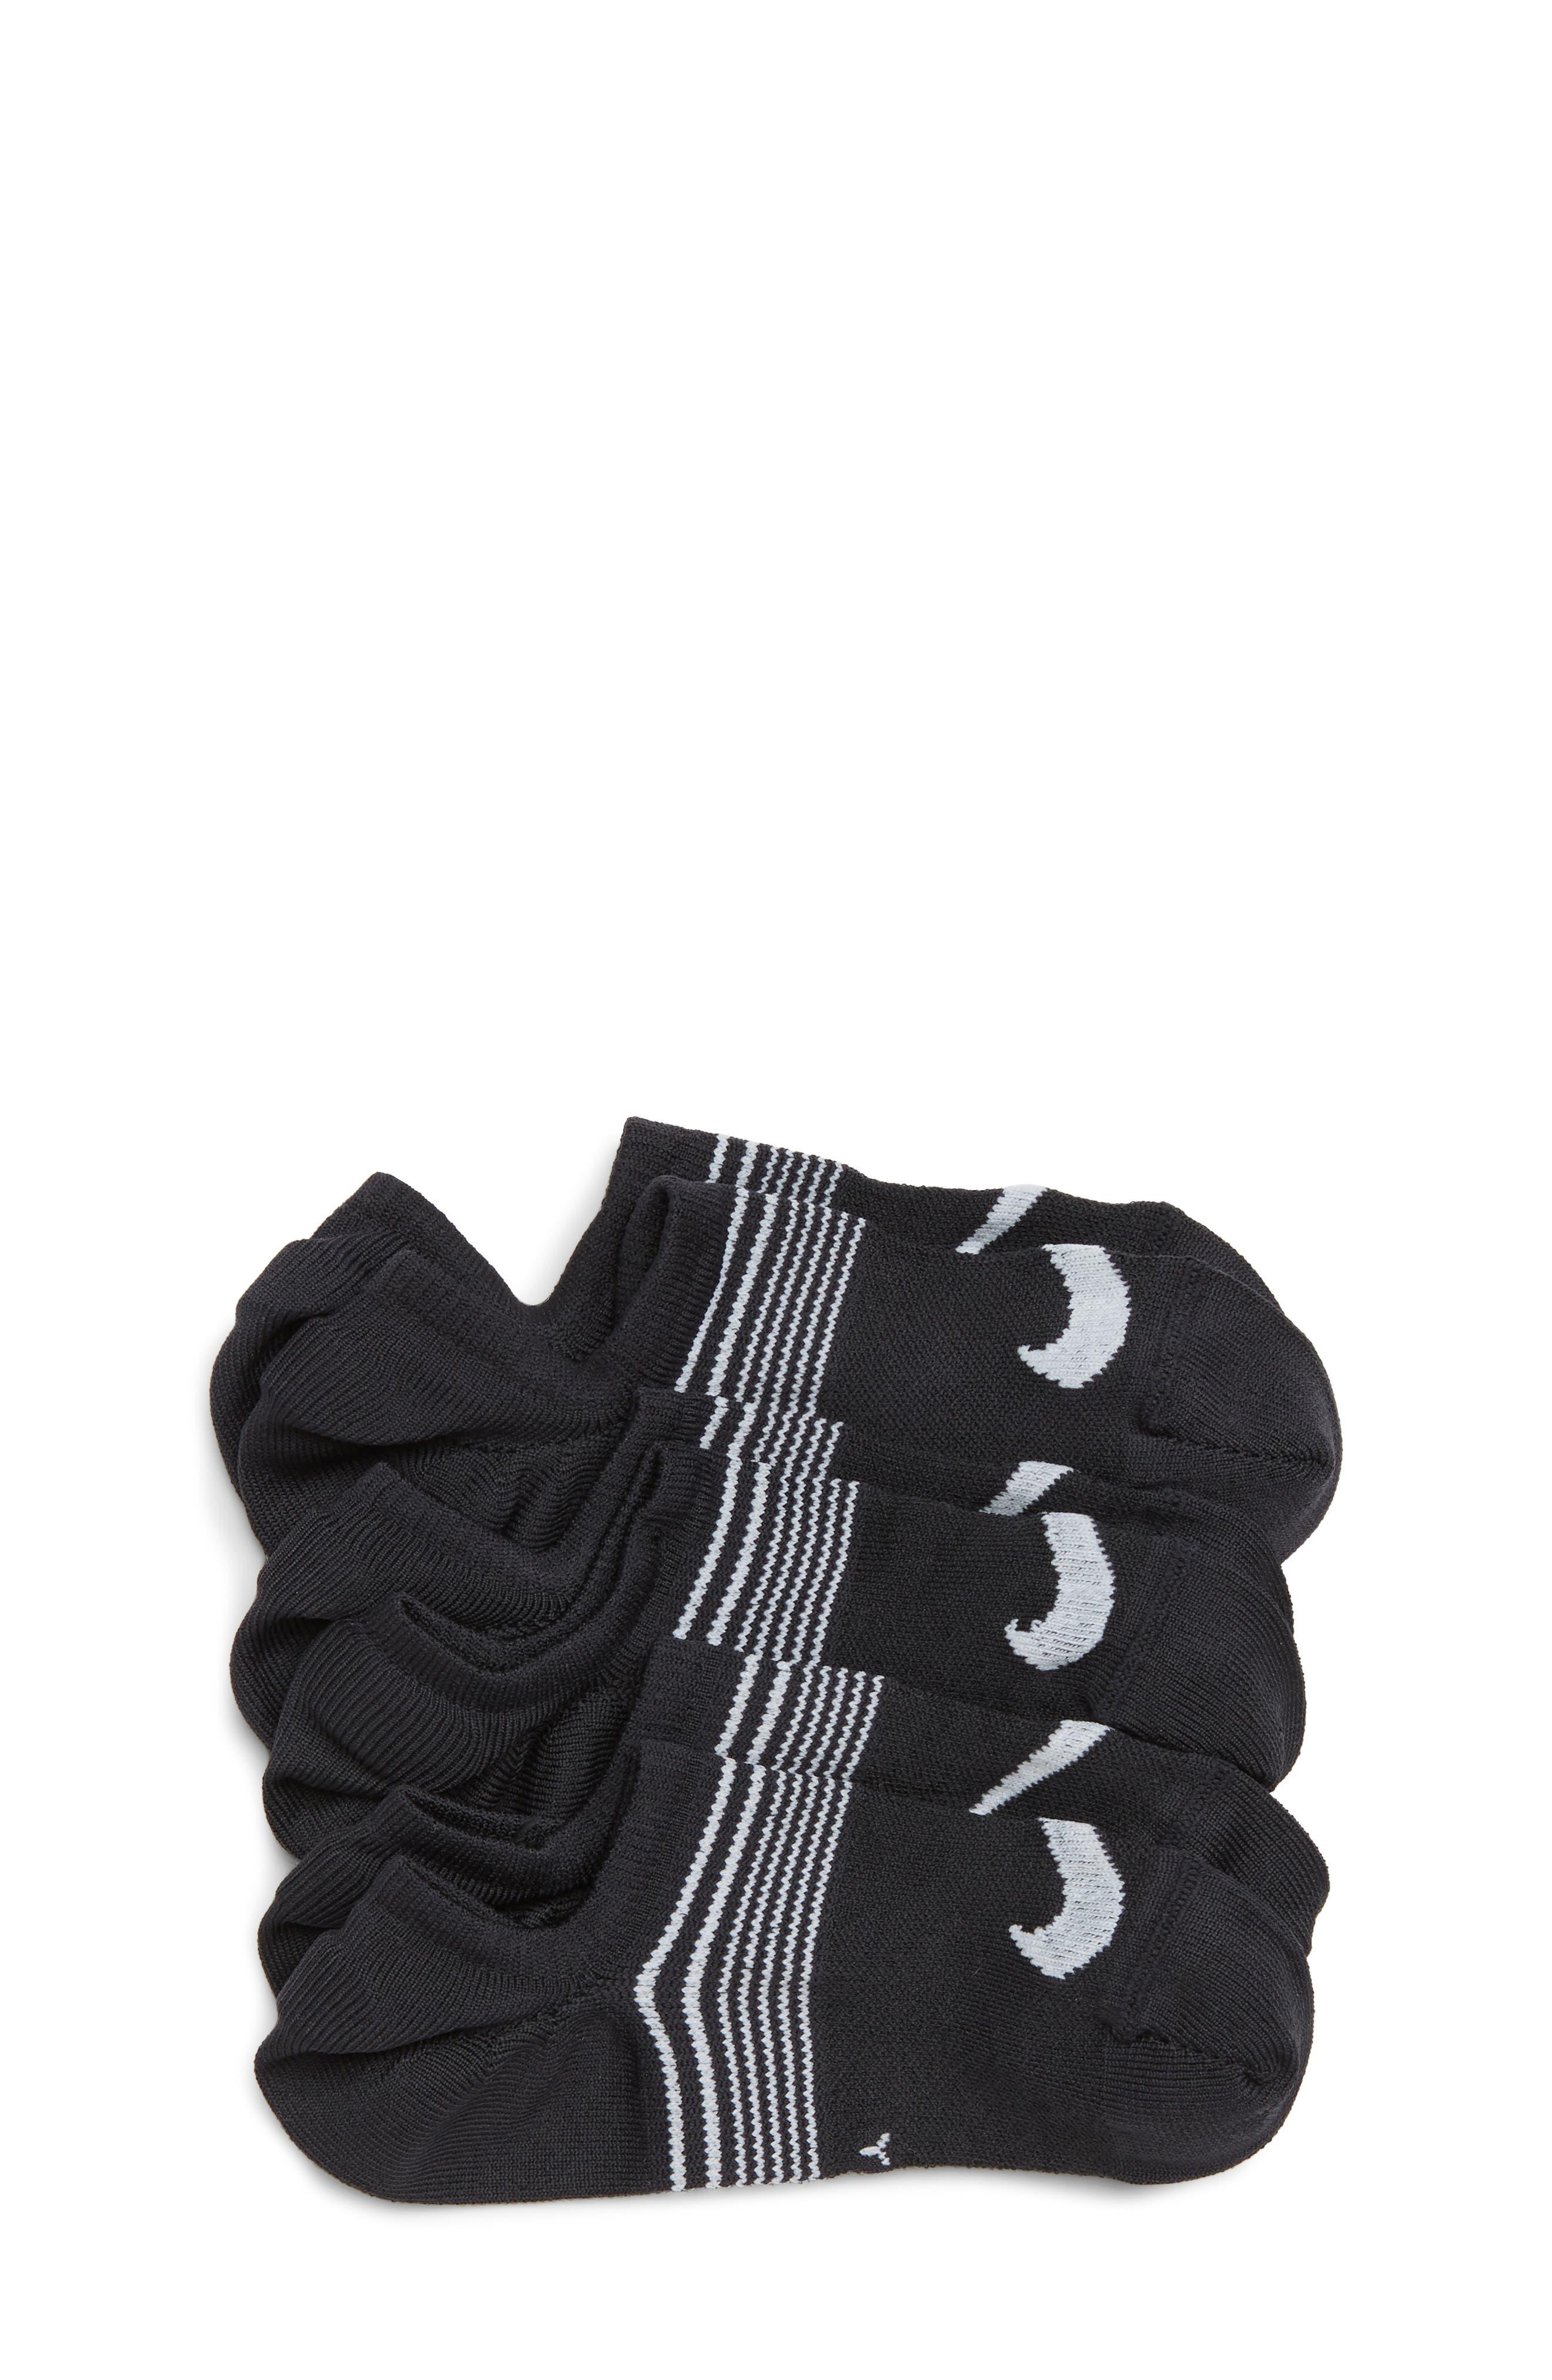 3-Pack No-Show Socks,                         Main,                         color, BLACK/ WHITE